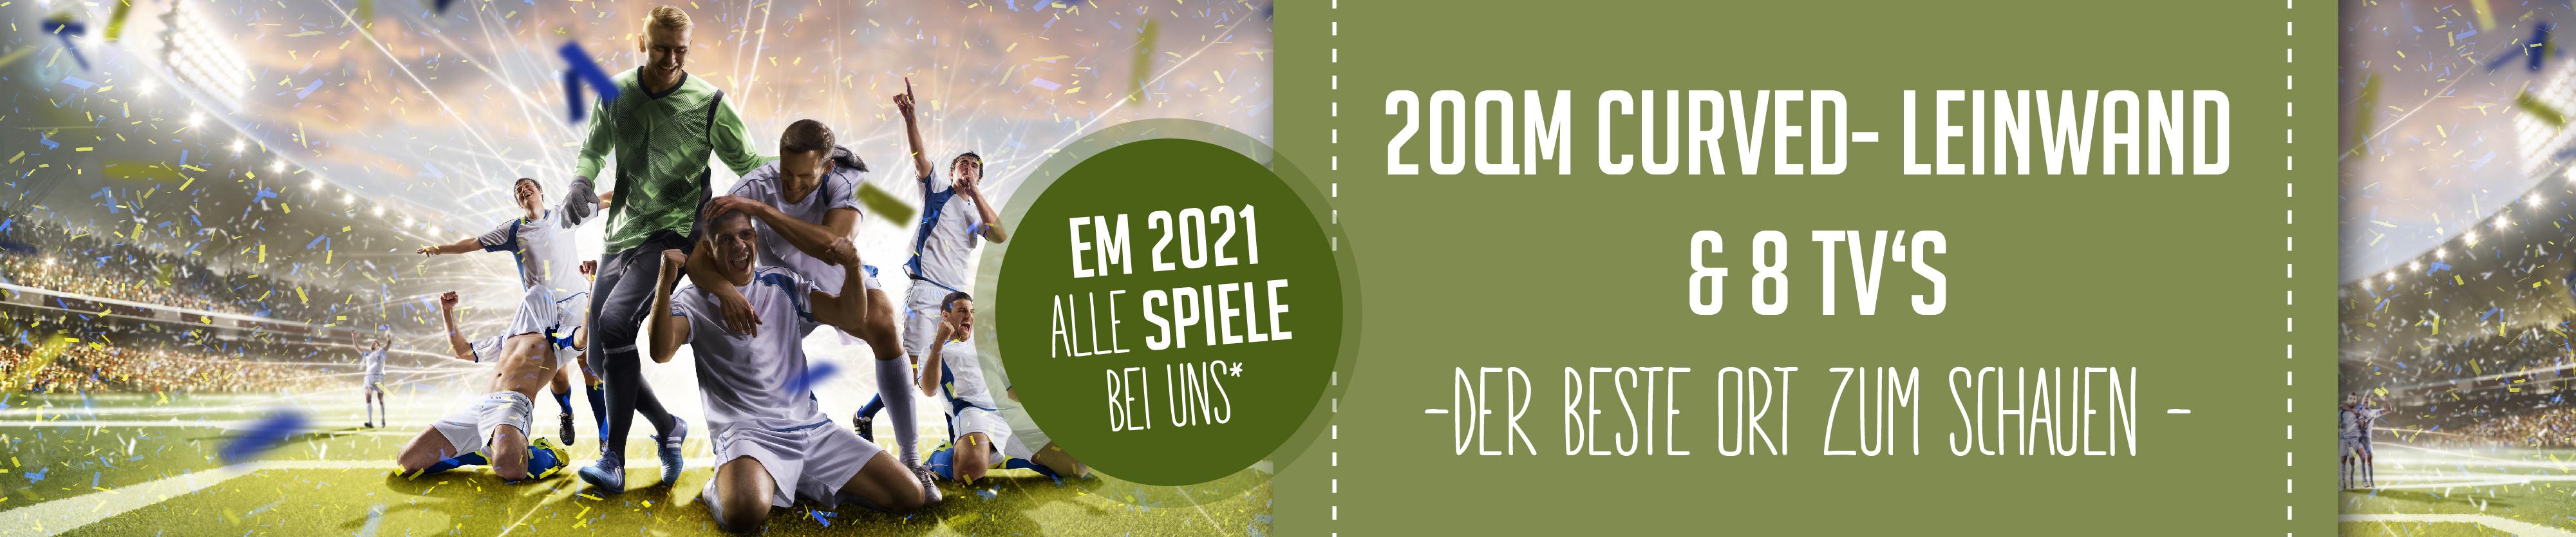 BNL_EM21_20qm_Curved-Leinwand-Homepage-01